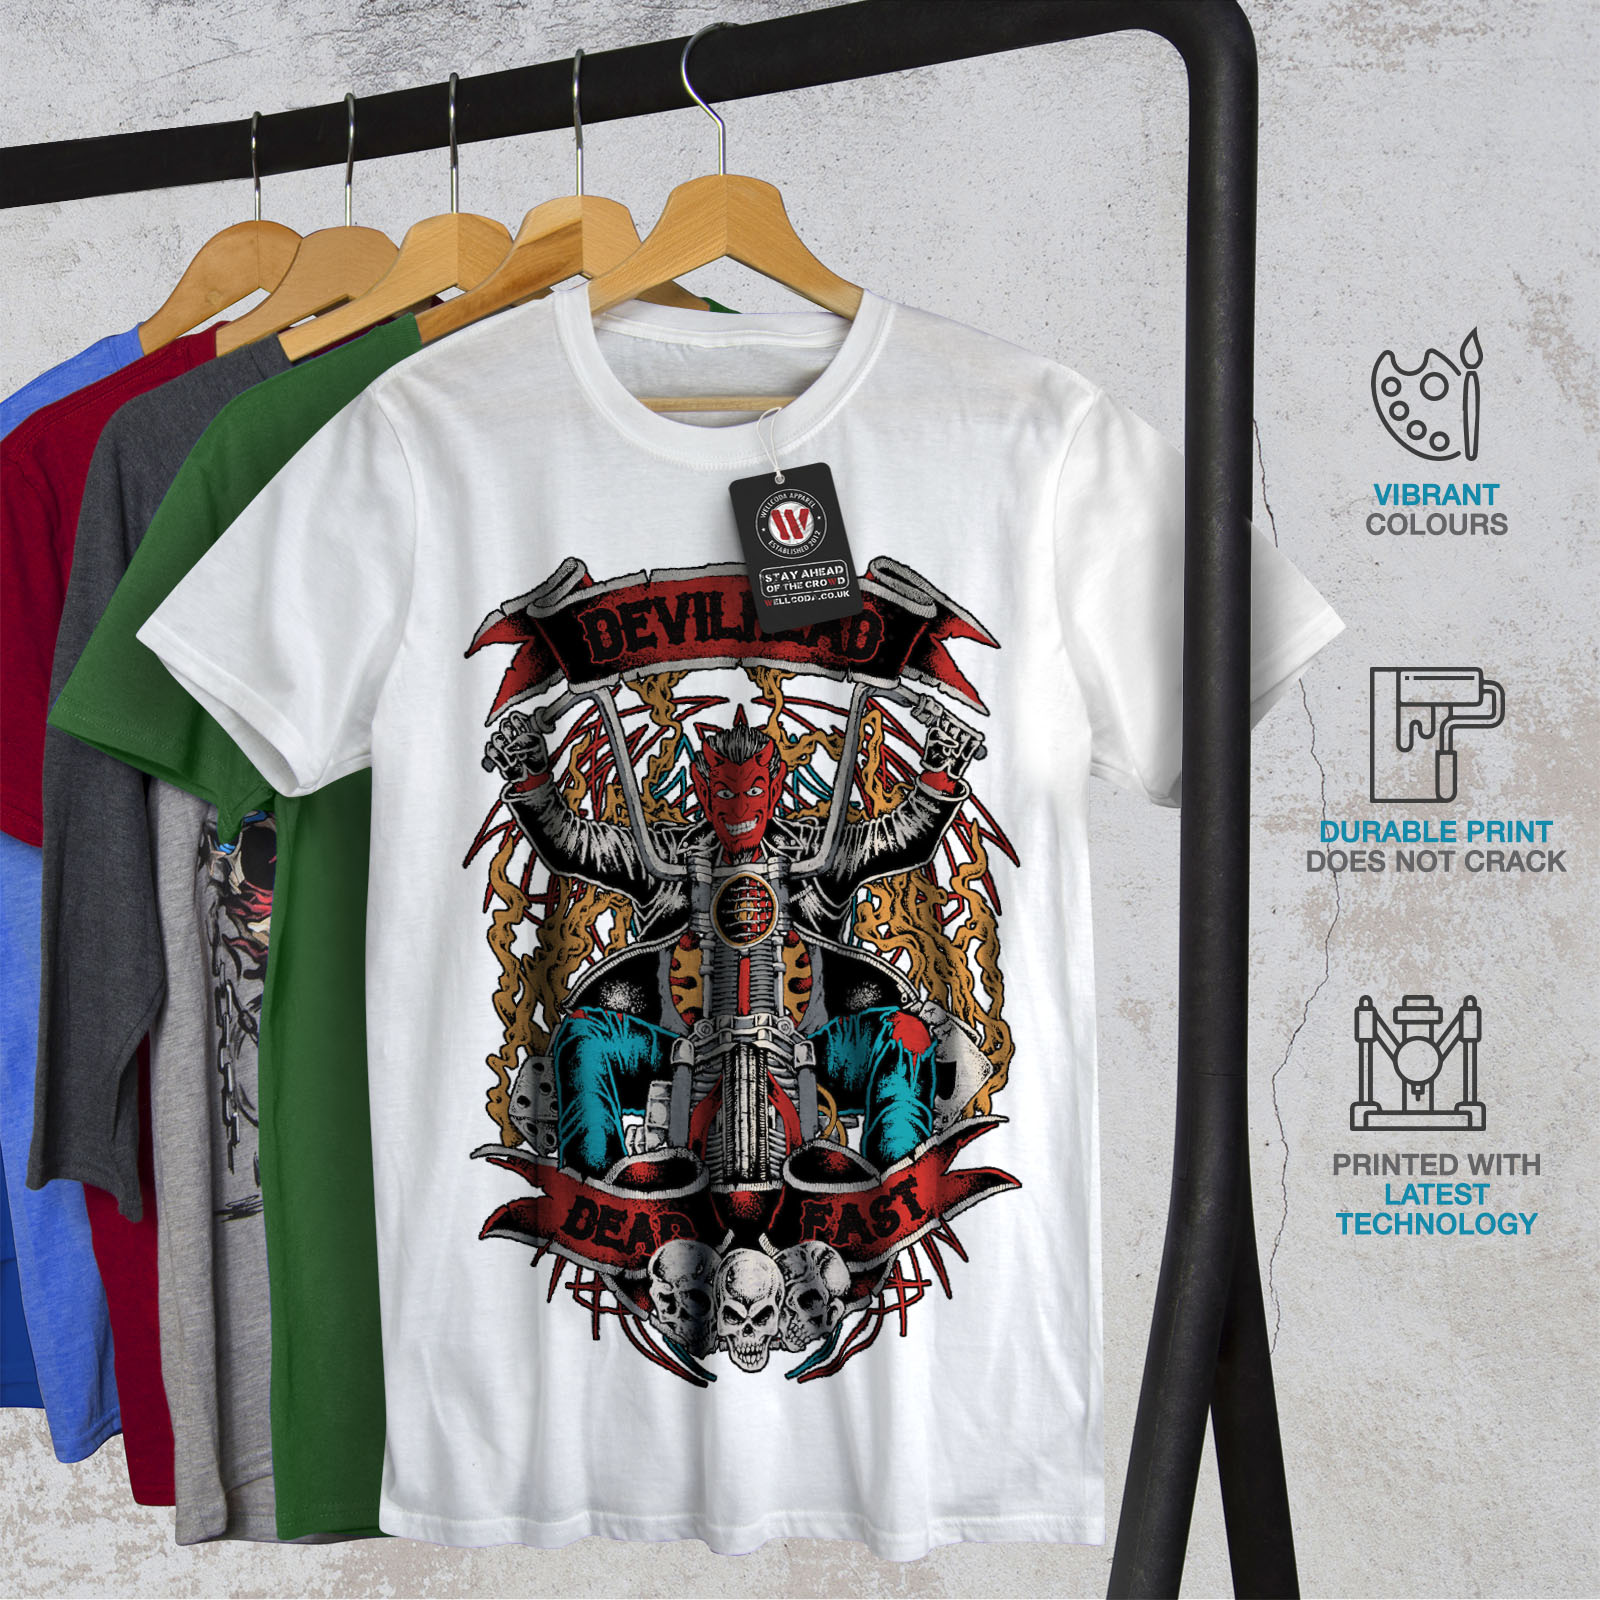 Wellcoda Gym diavolo satana horror Uomo T-shirt 0 Graphic Design Stampato Tee